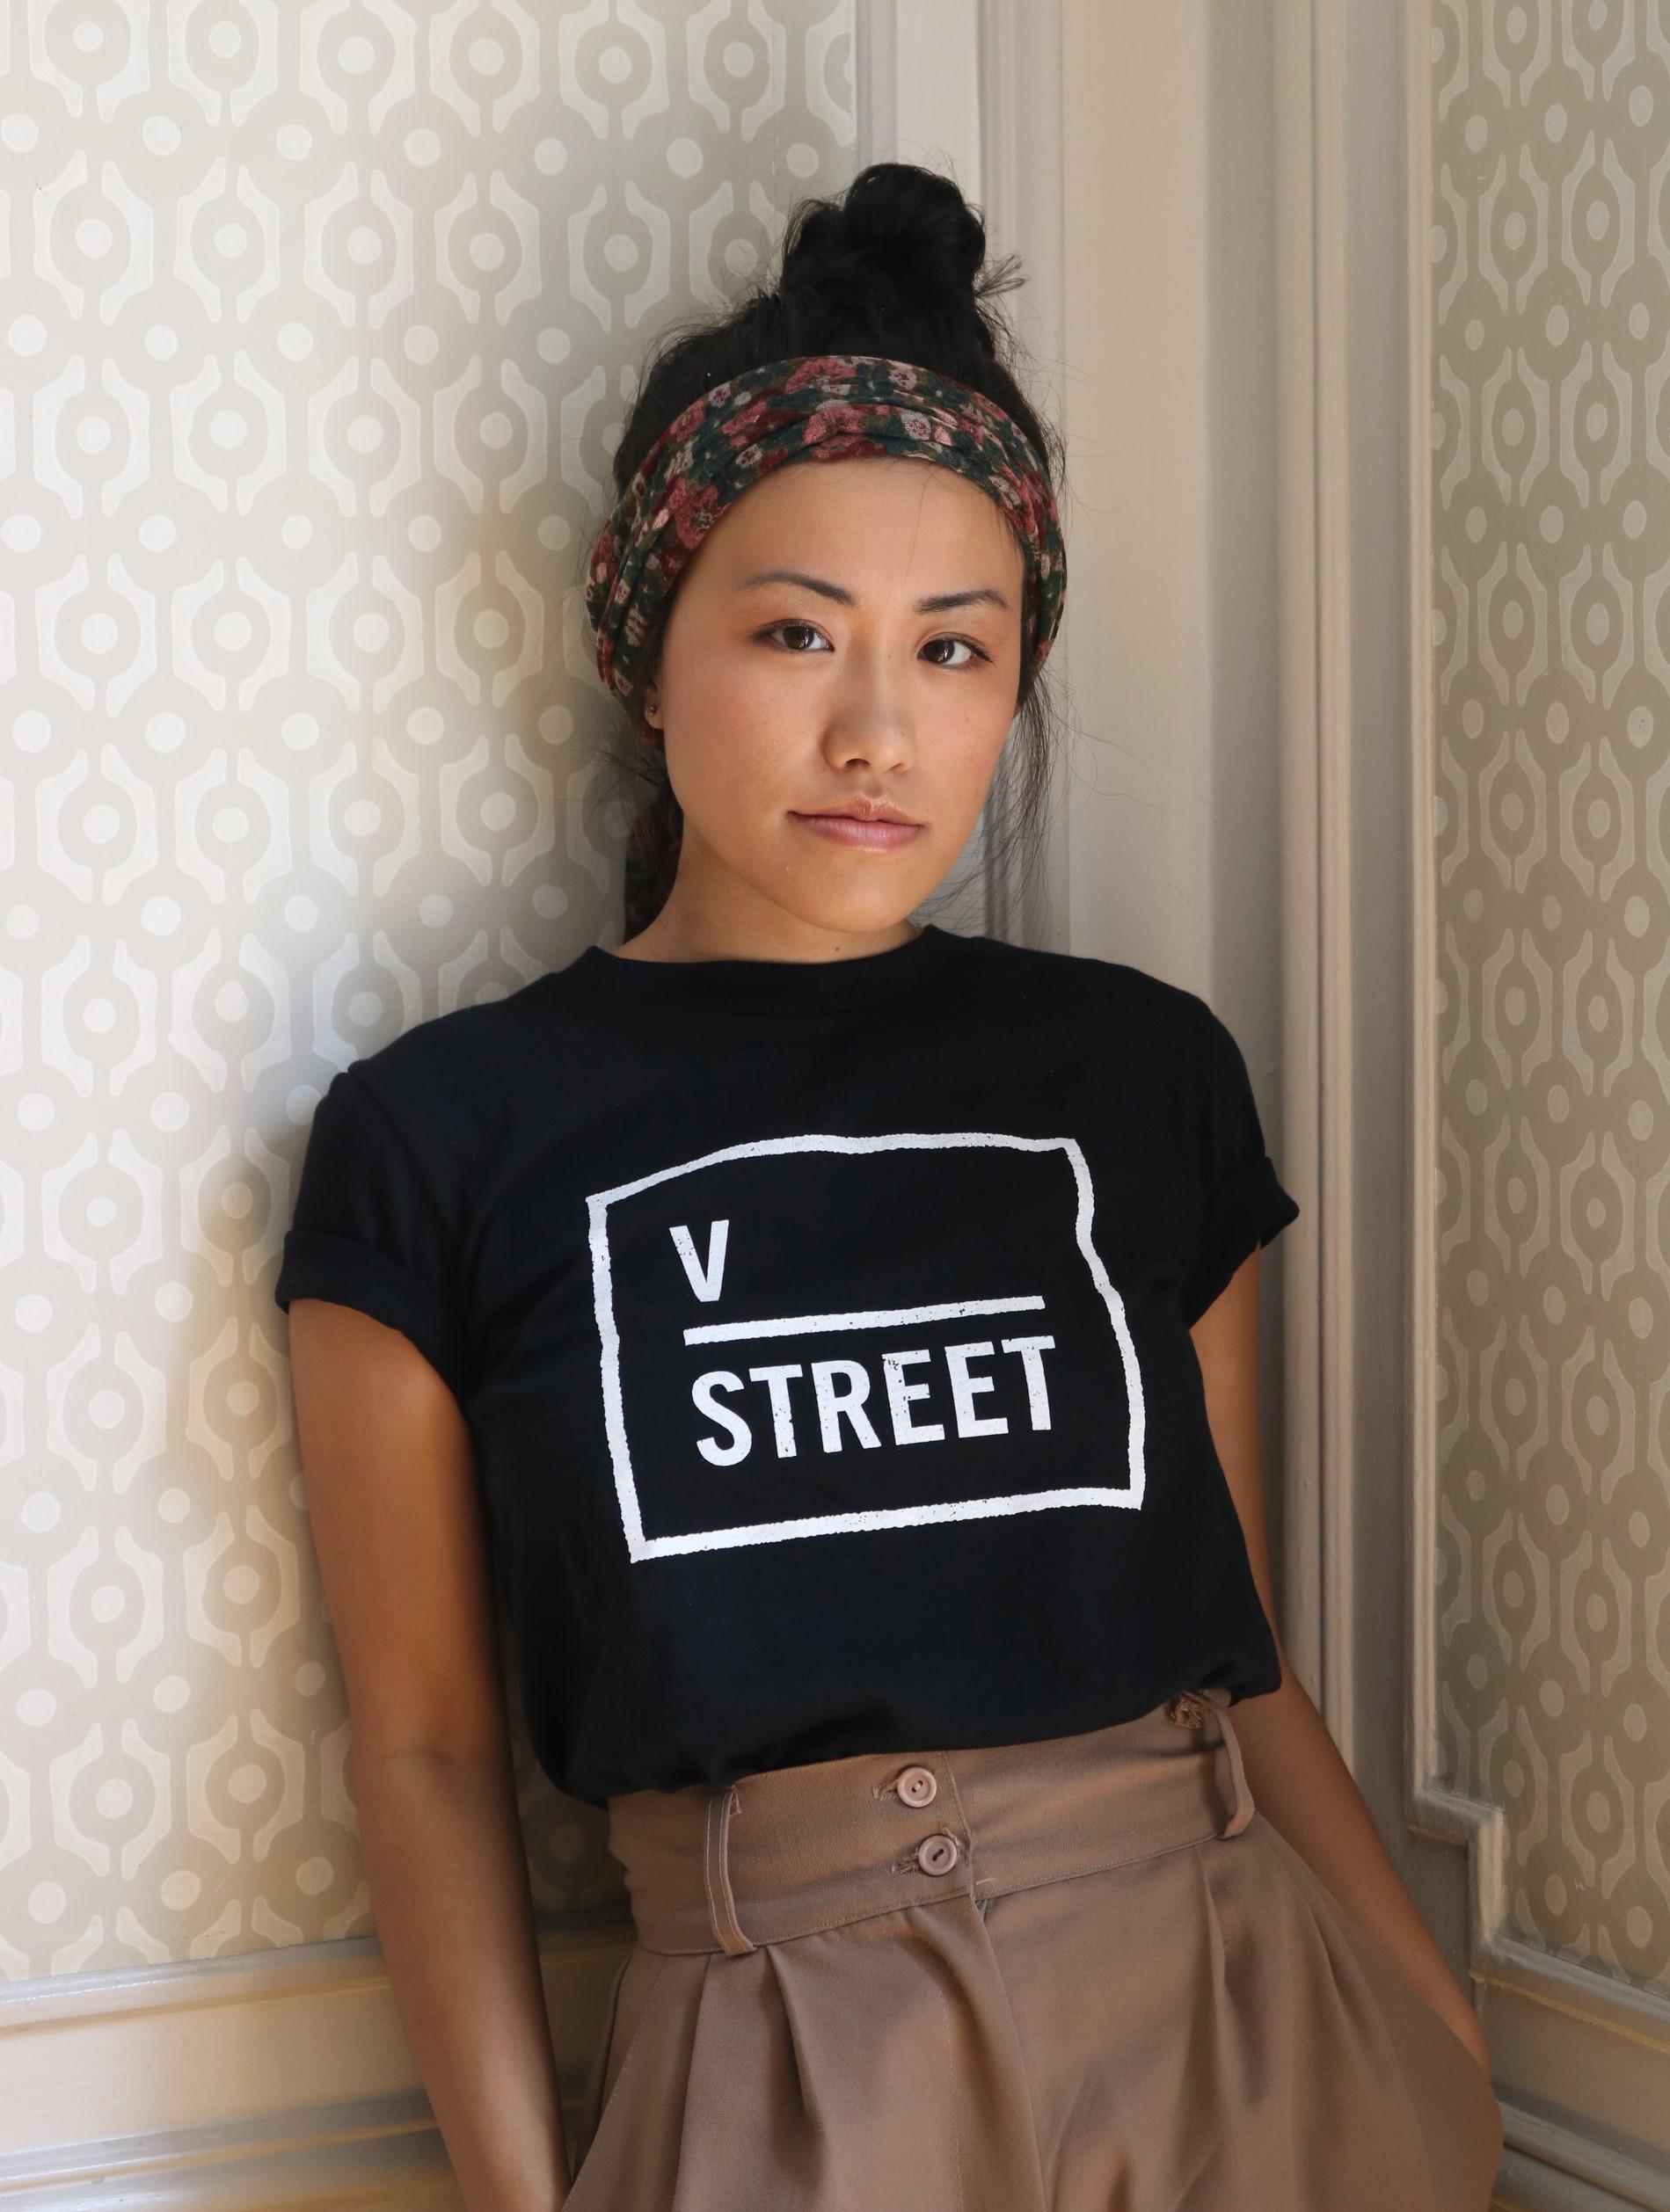 V Street Tee Shirt